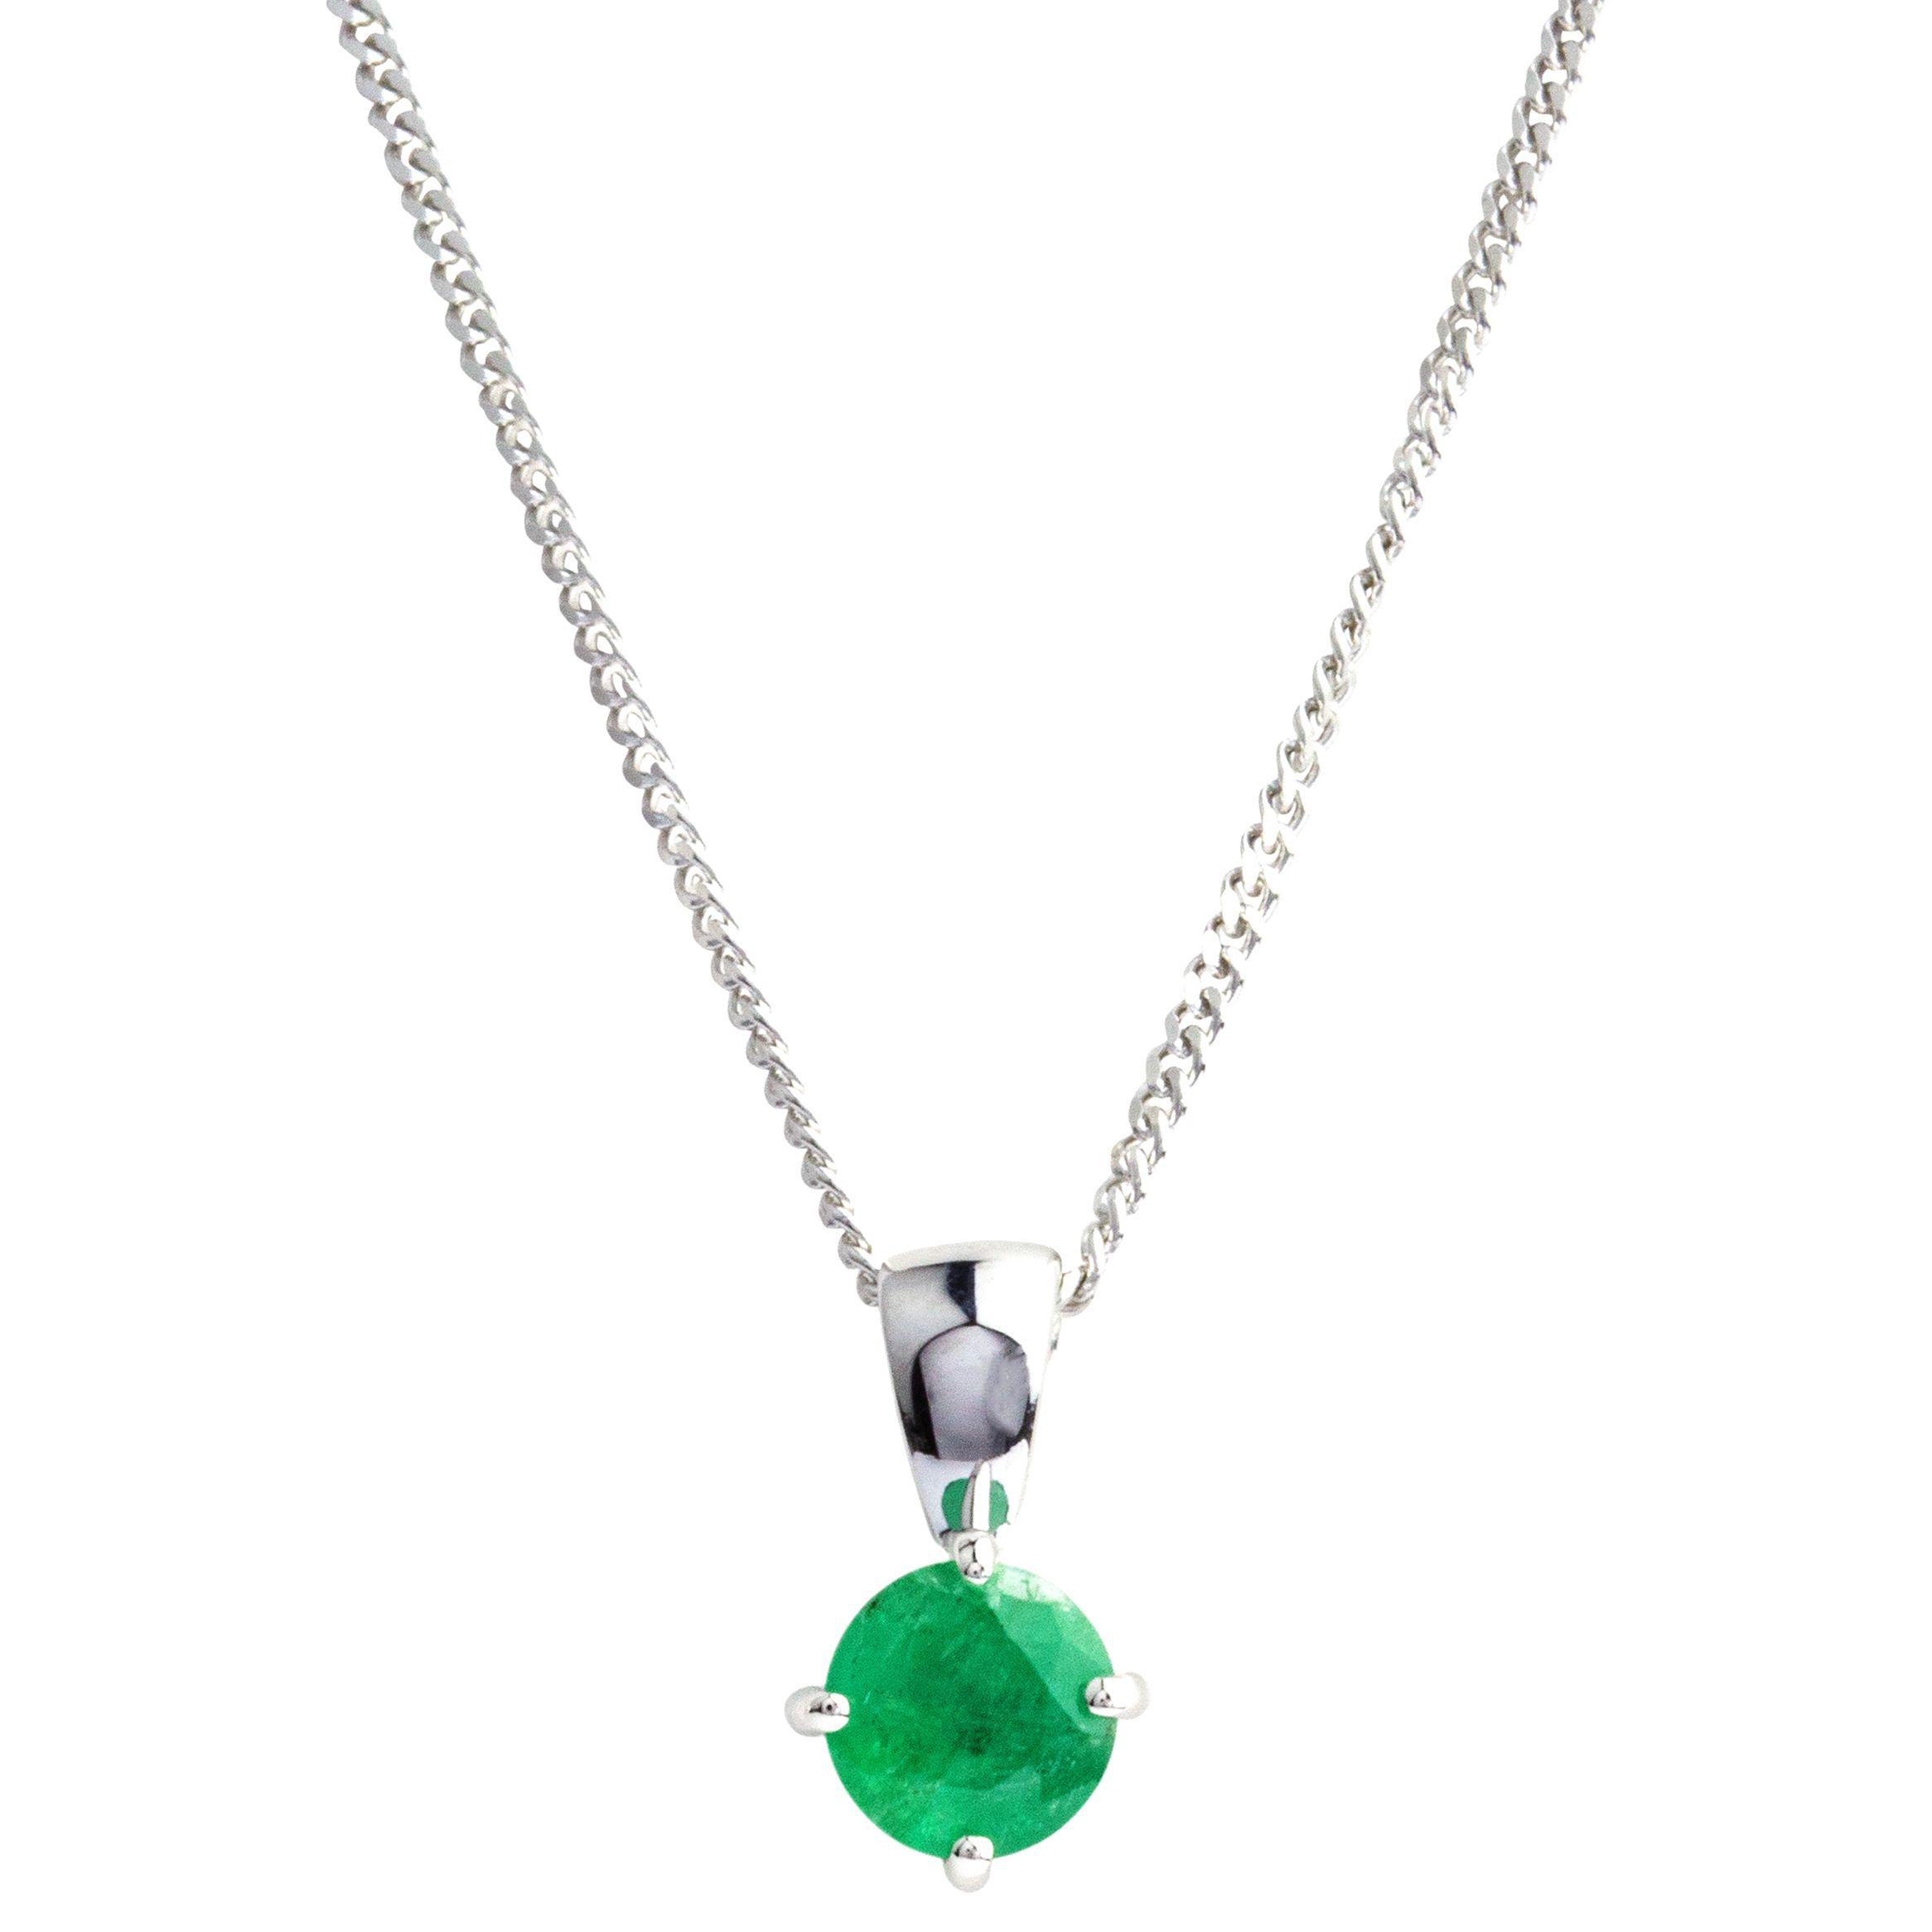 A B Davis A B Davis 9ct White Gold Round Emerald Pendant Necklace